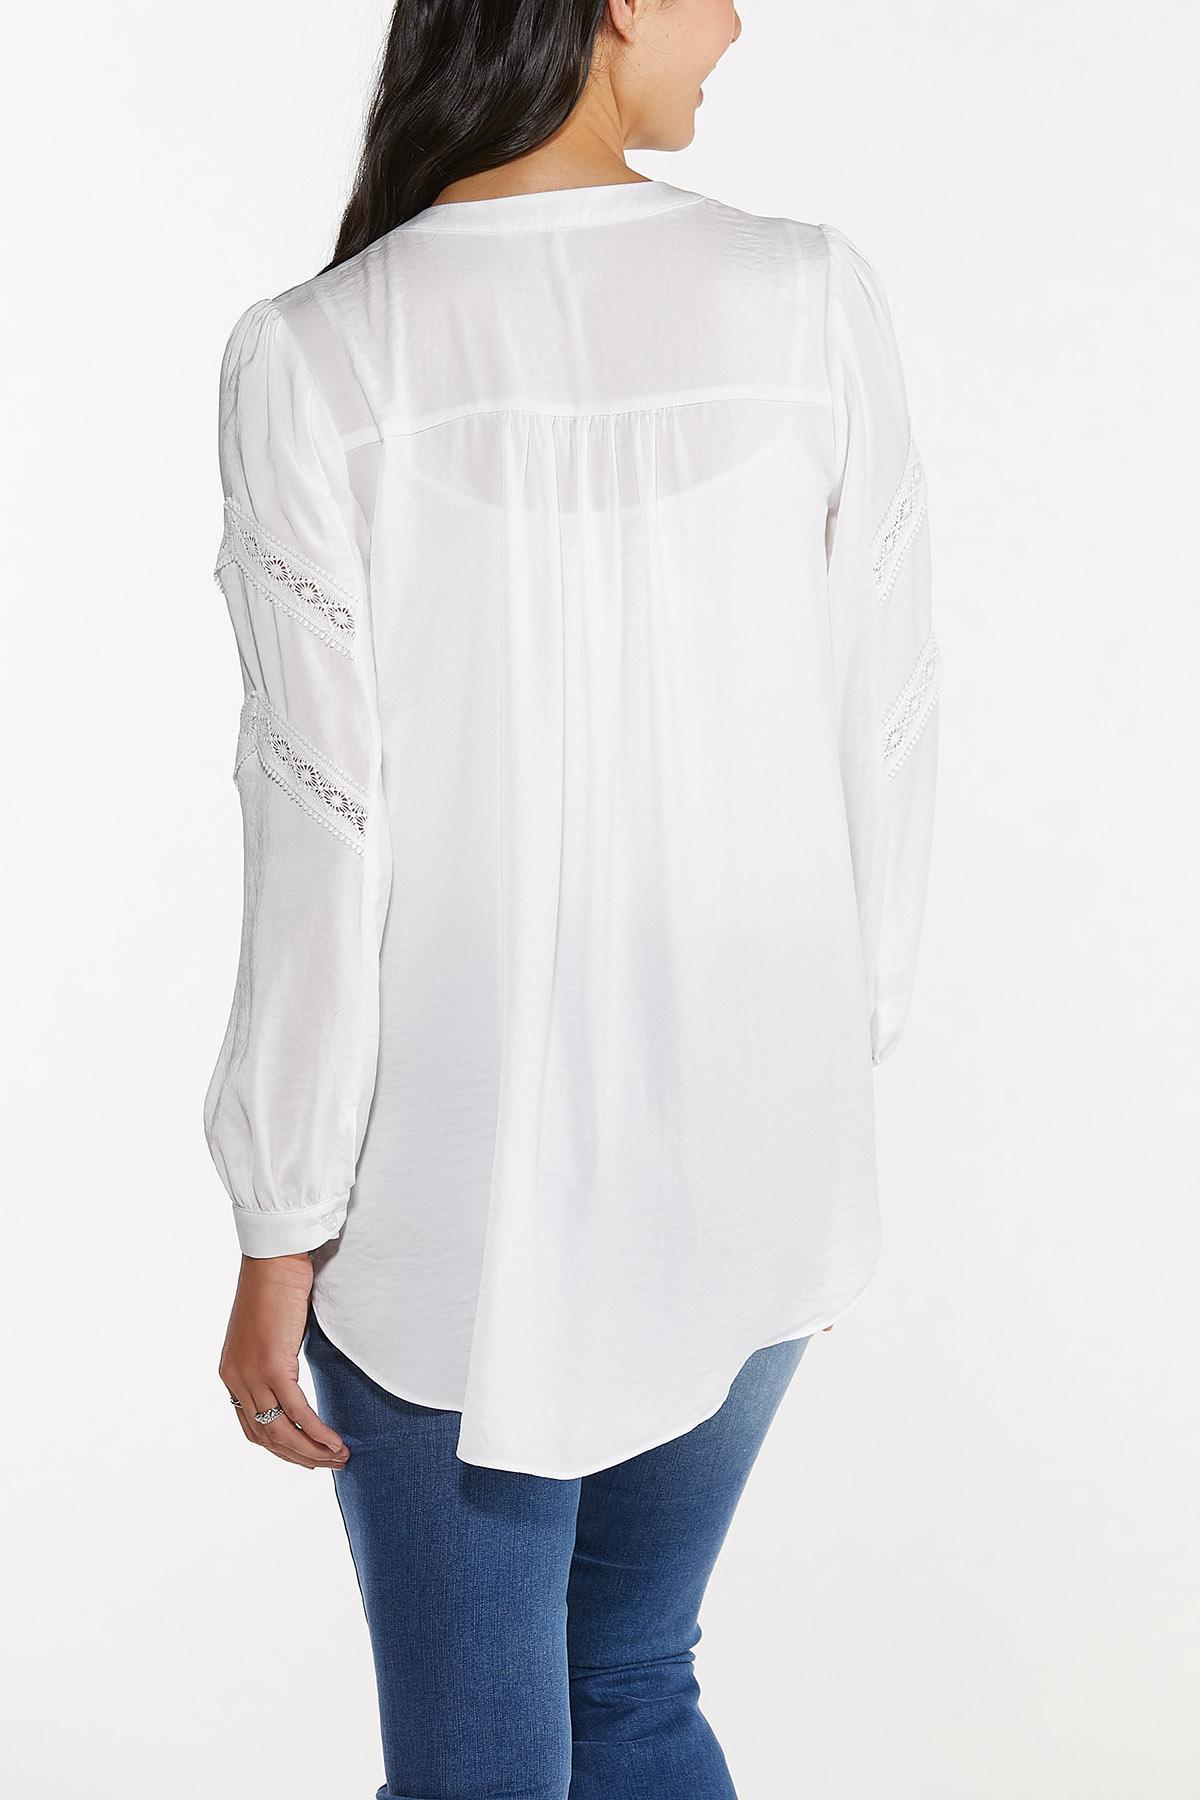 Lace Trim Tunic (Item #44665410)